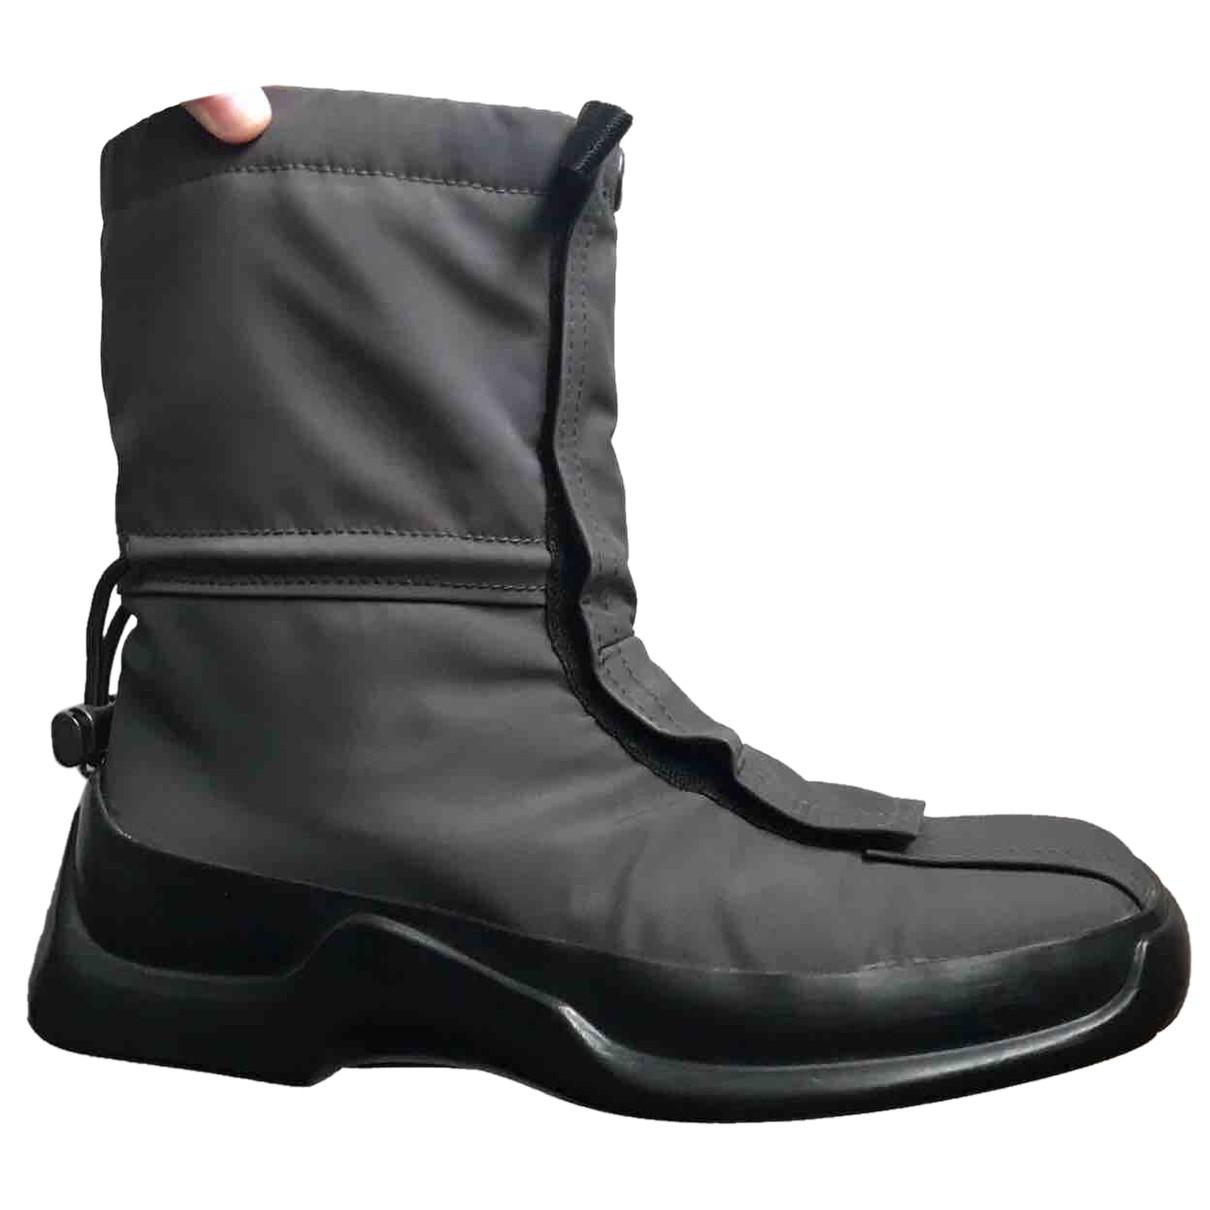 Prada N Black Cloth Boots for Women 38 EU